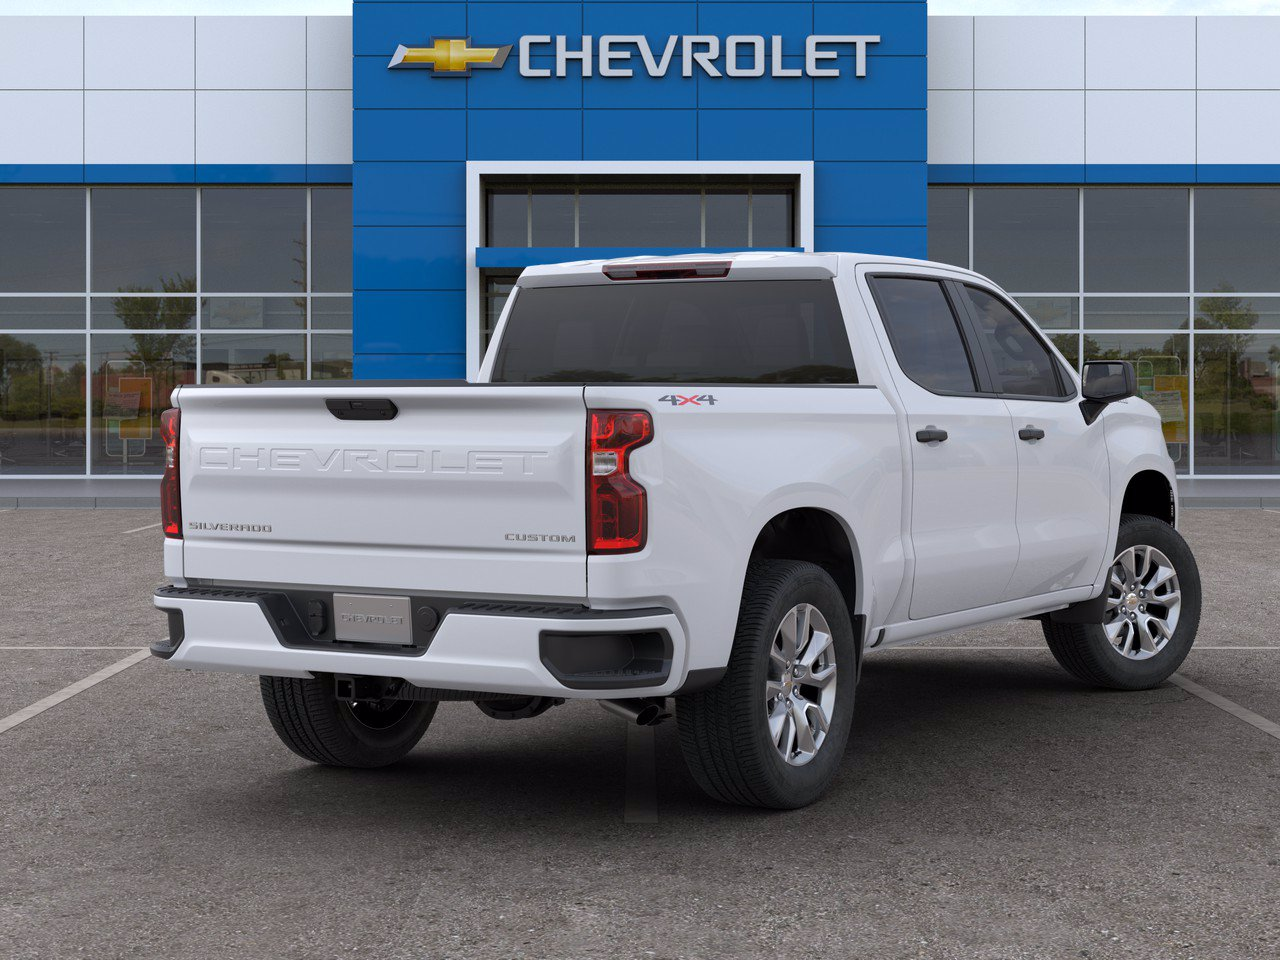 2020 Chevrolet Silverado 1500 Crew Cab 4x4, Pickup #C201388 - photo 2